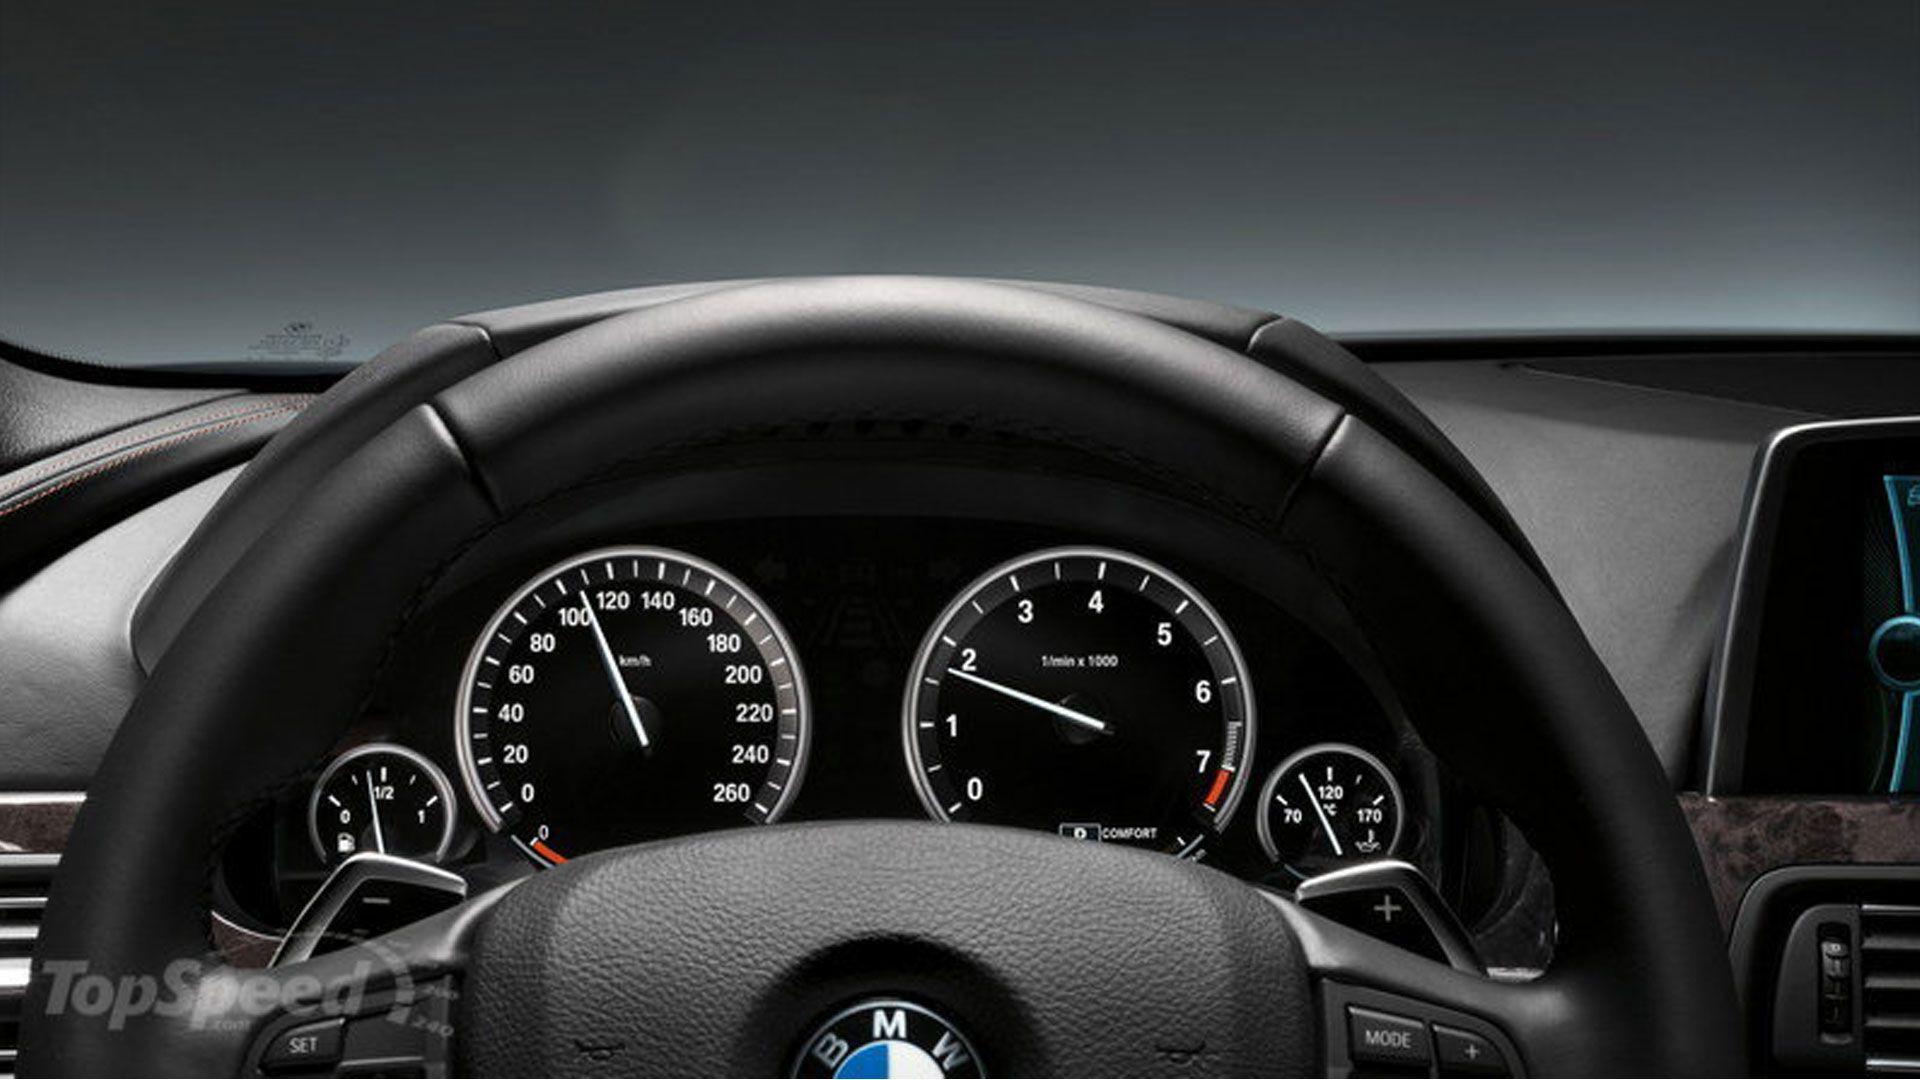 Mew-BMW-6-Series-M-Sport-red-wallpaper-4 - Freak Wheel